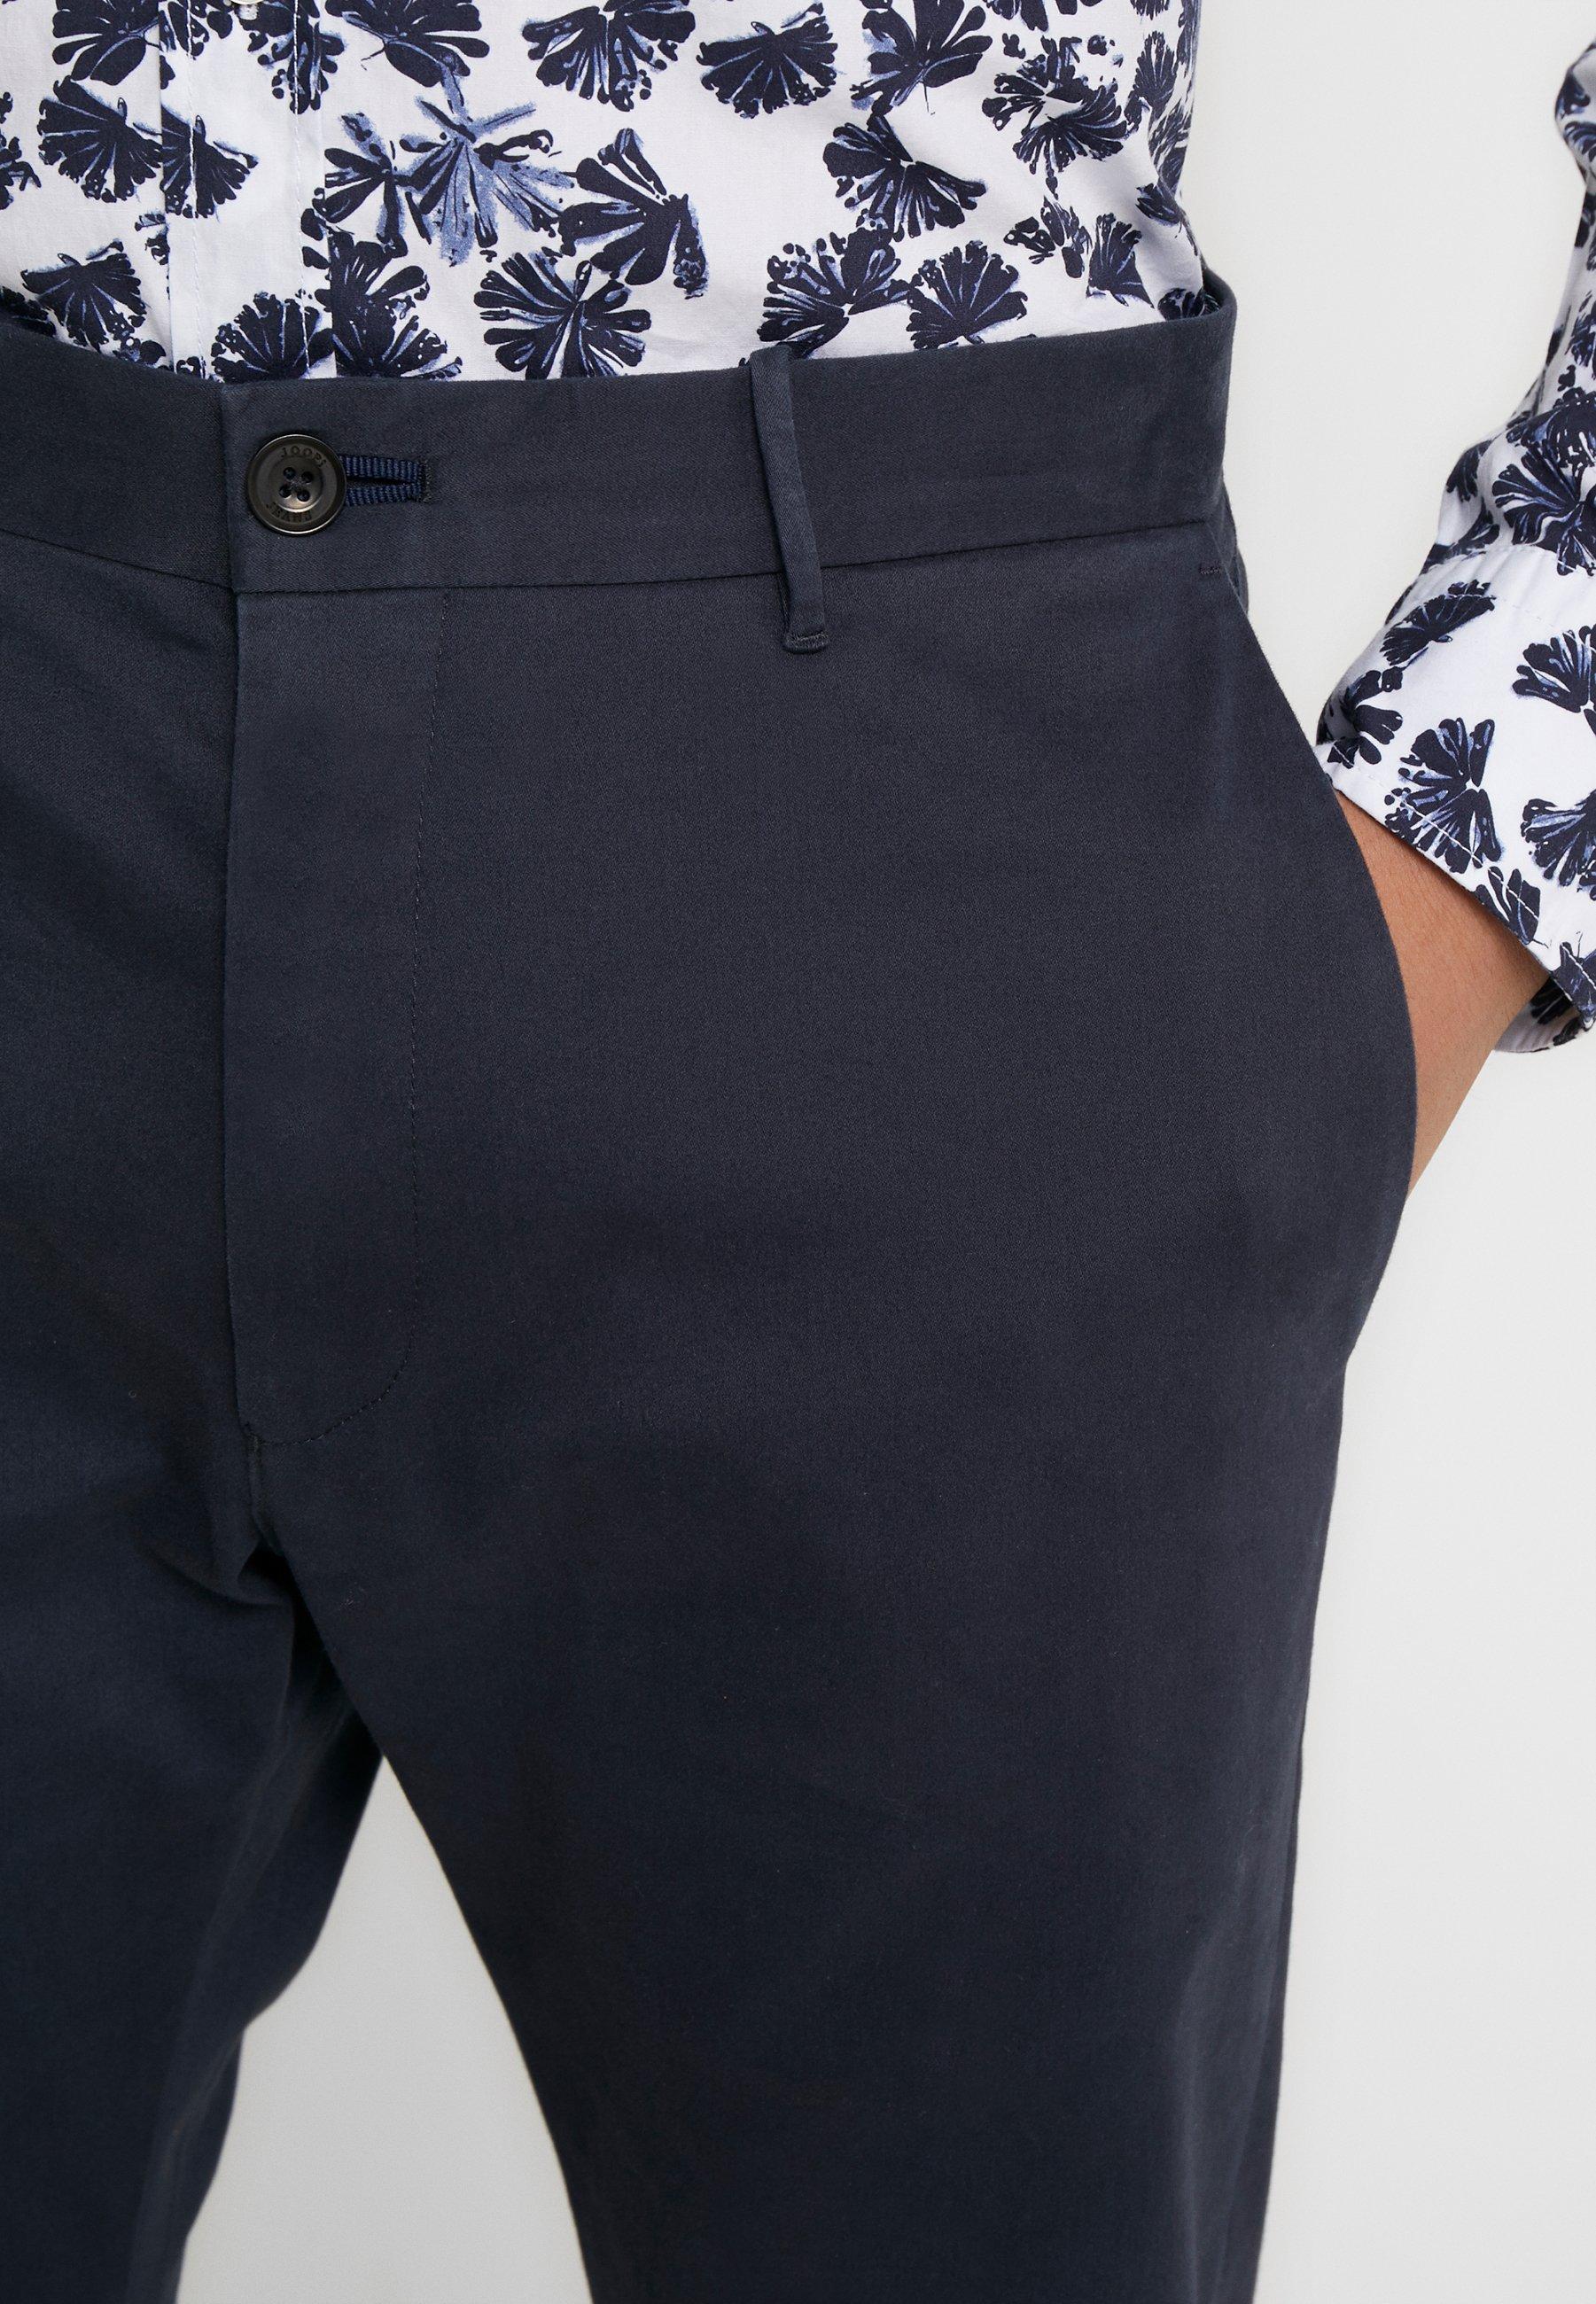 Joop! Jeans Stehen - Chinosy Navy